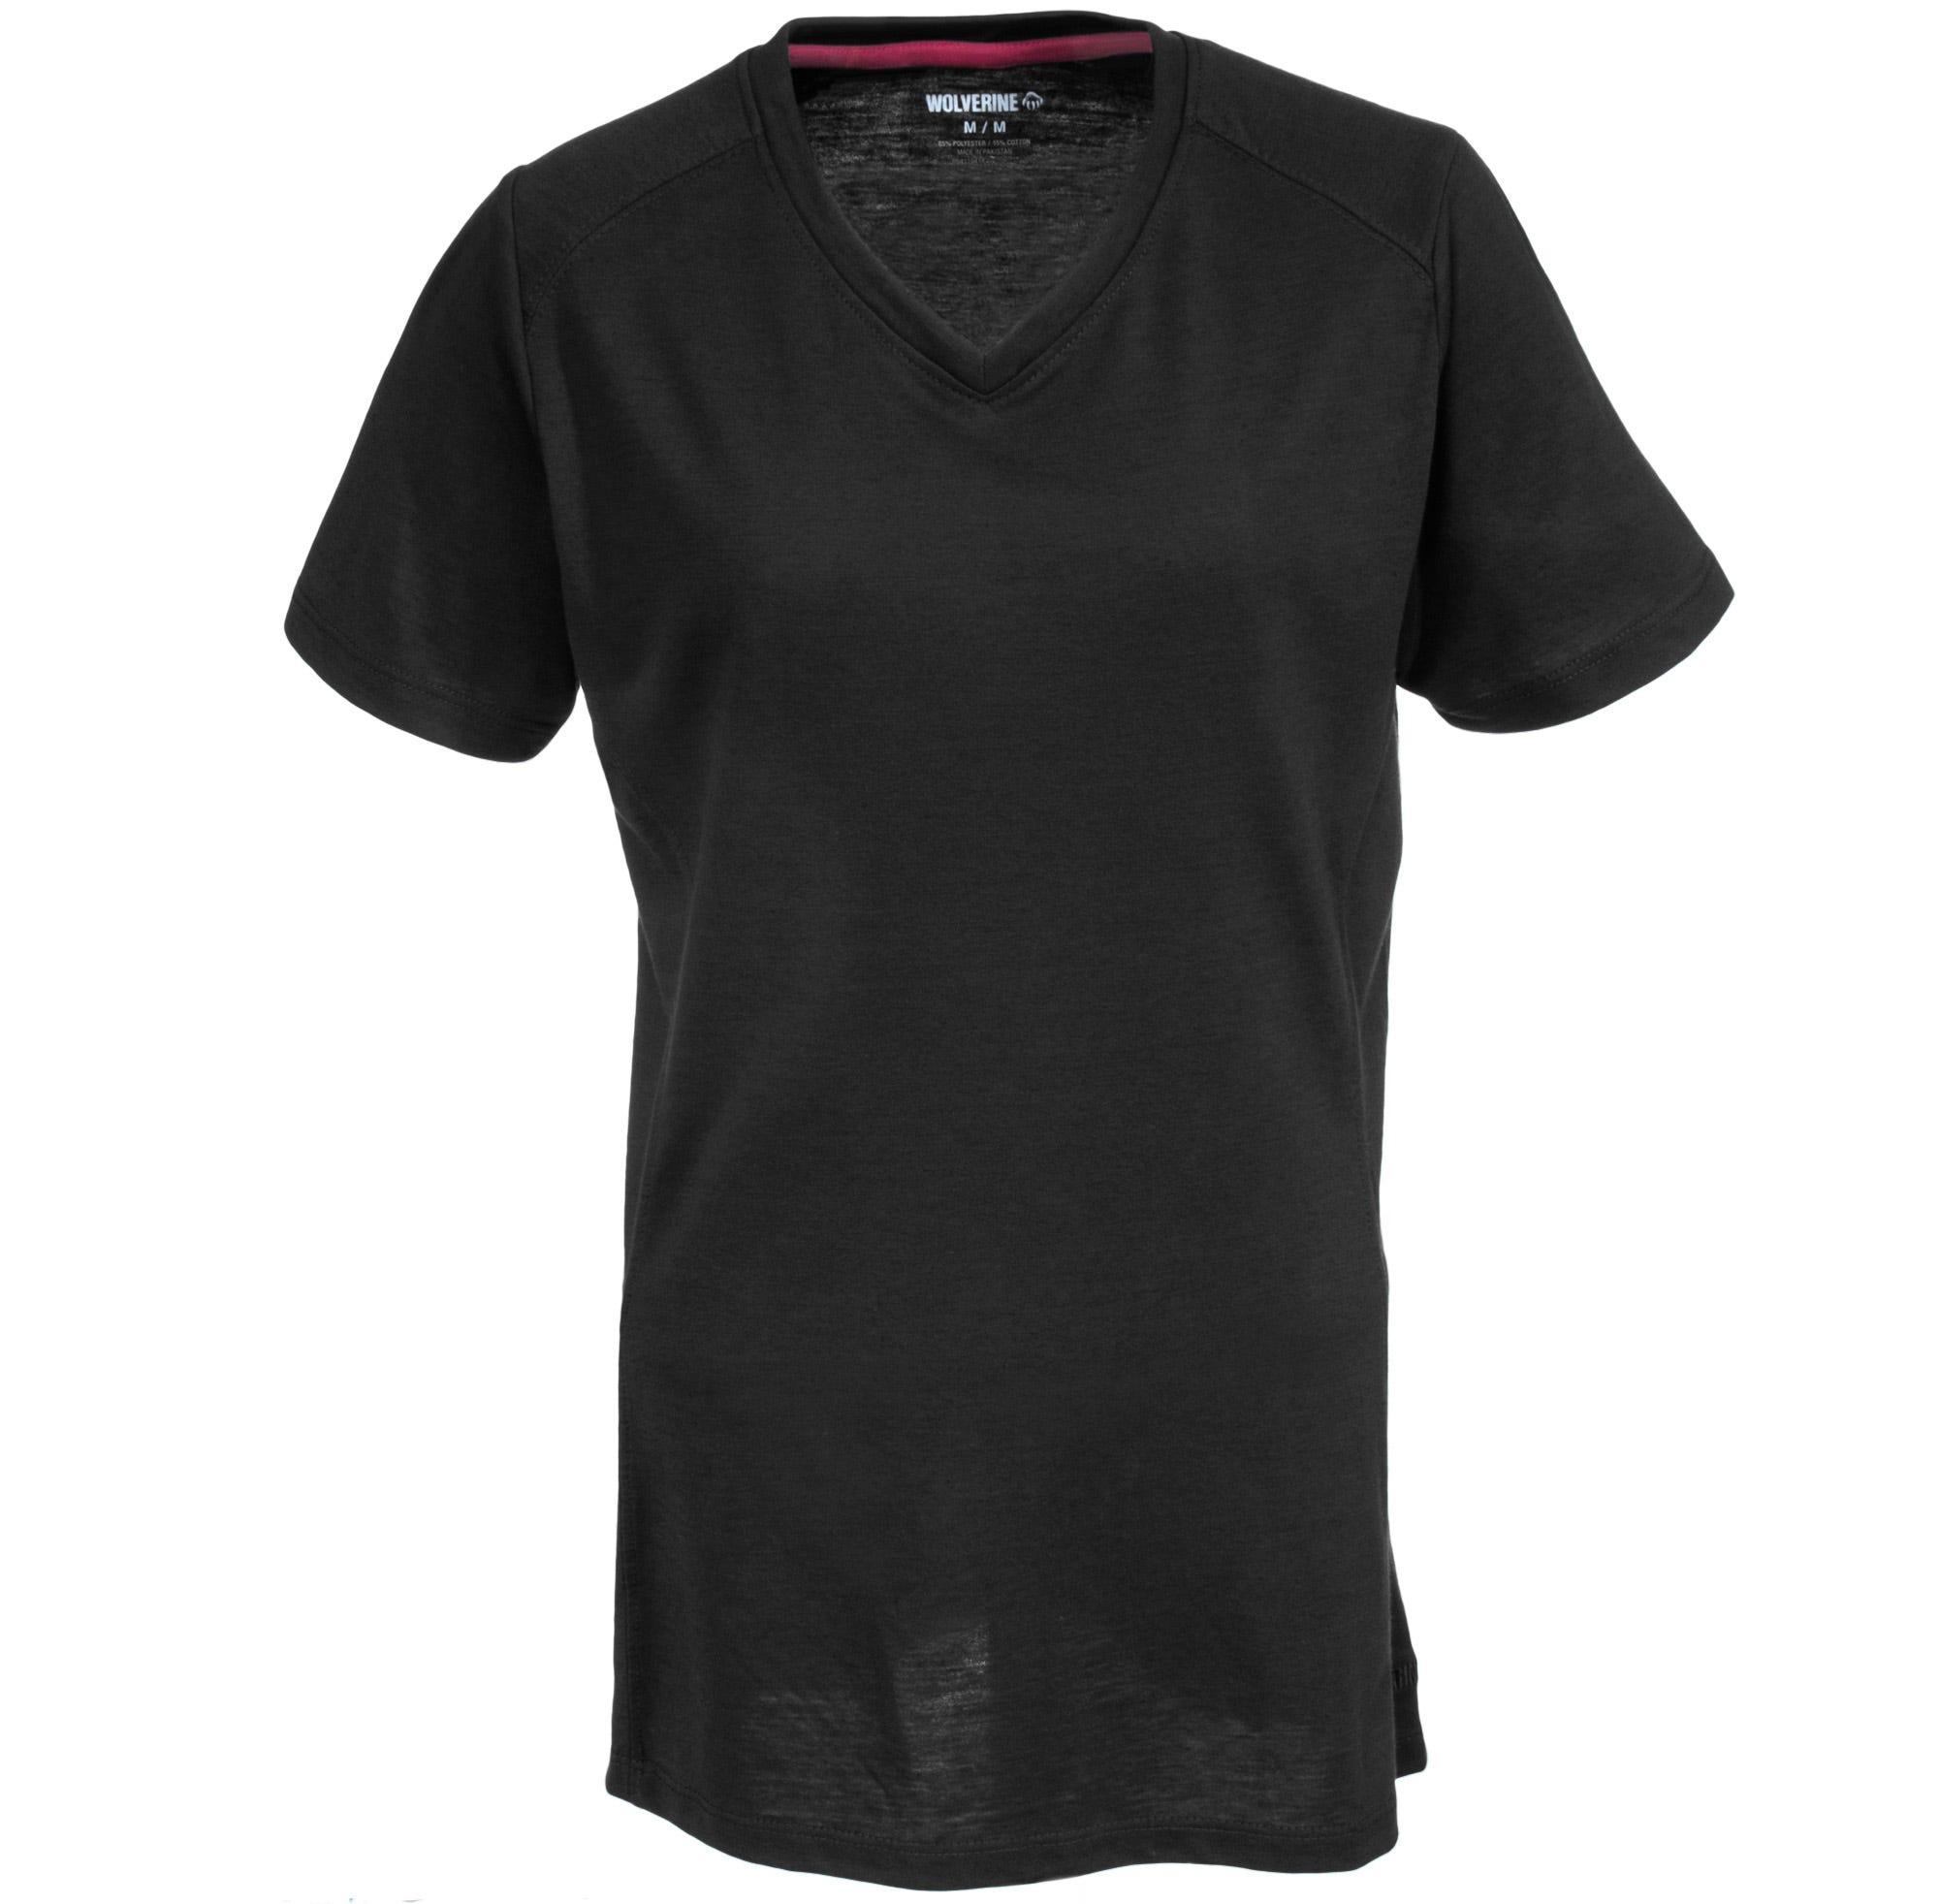 Wolverine Piper W1204590 003 Women's Black Short Sleeve Shirt